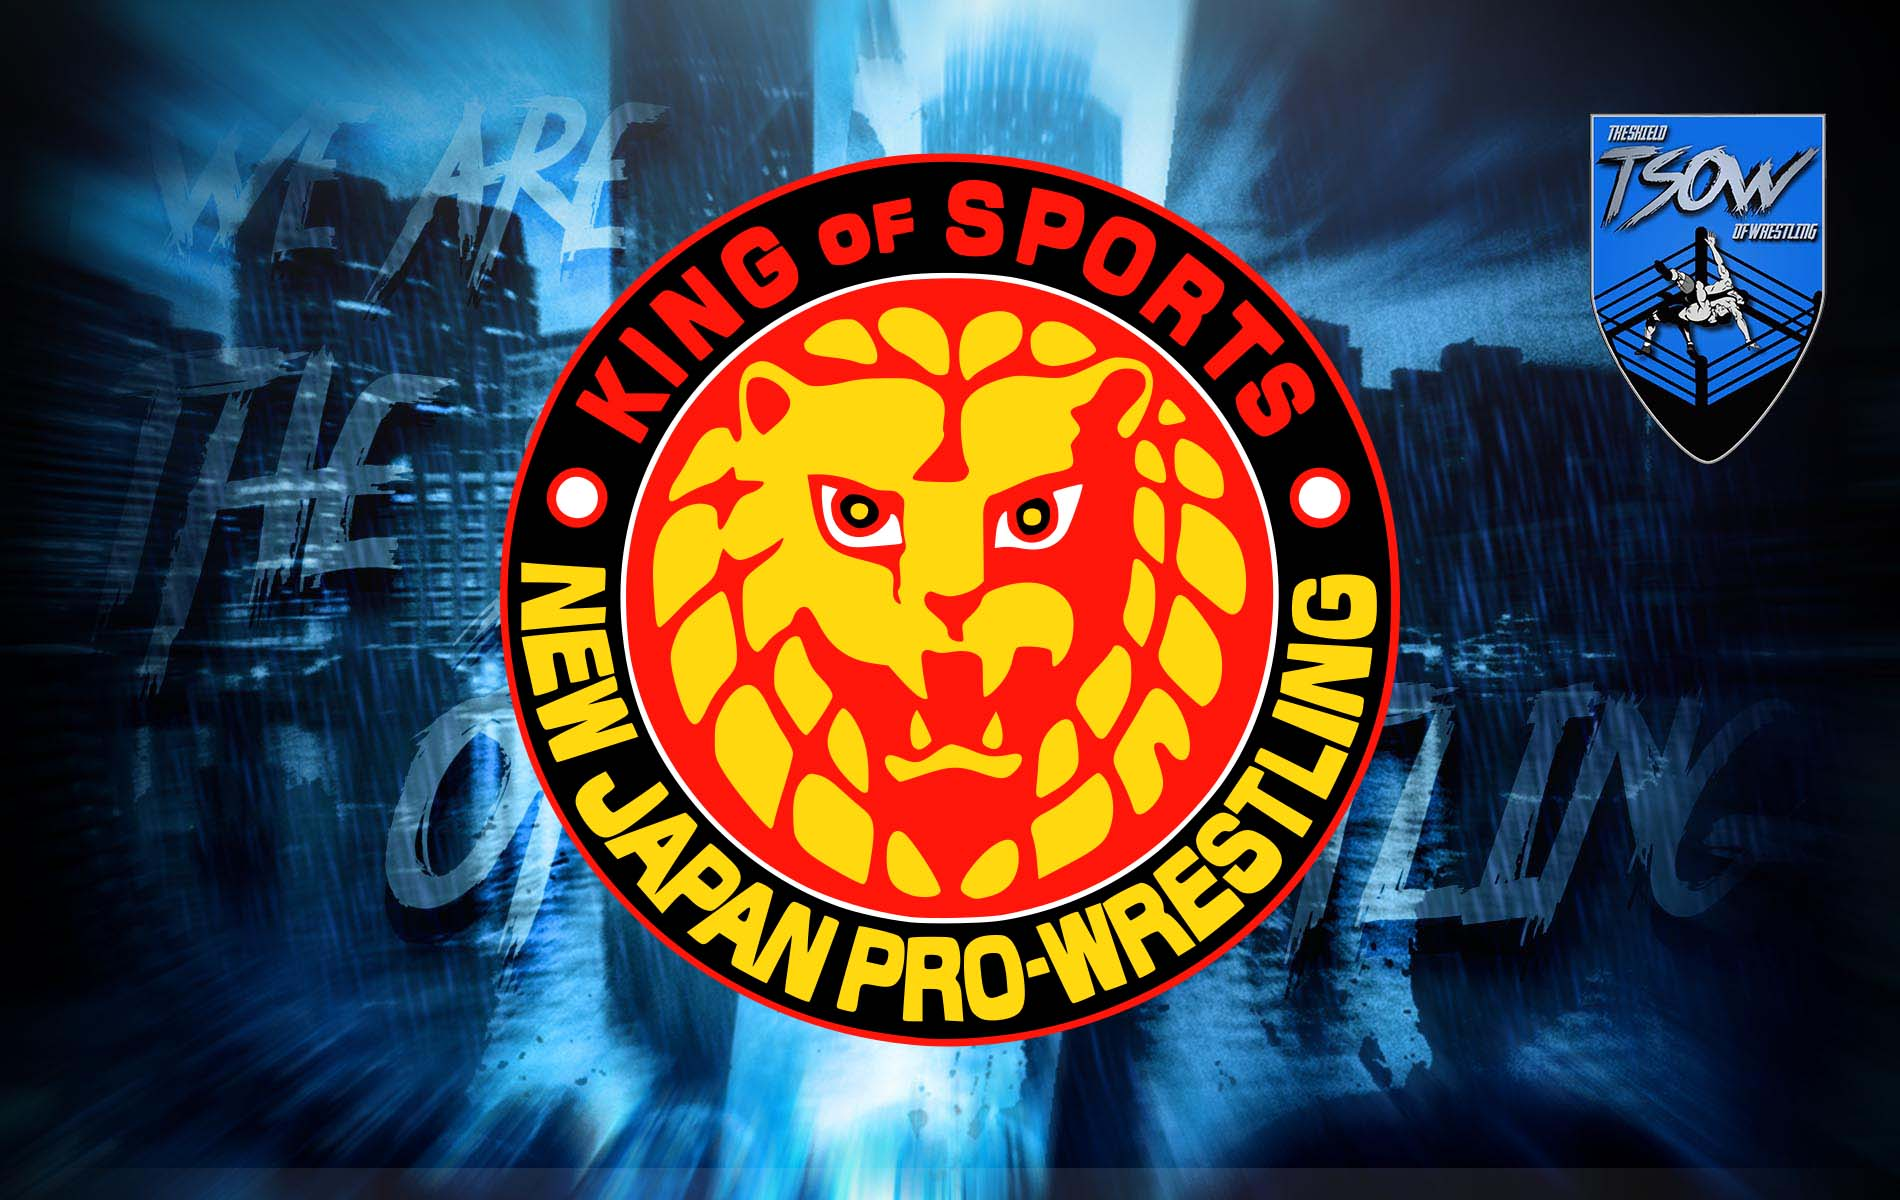 NJPW: due atleti positivi al COVID-19